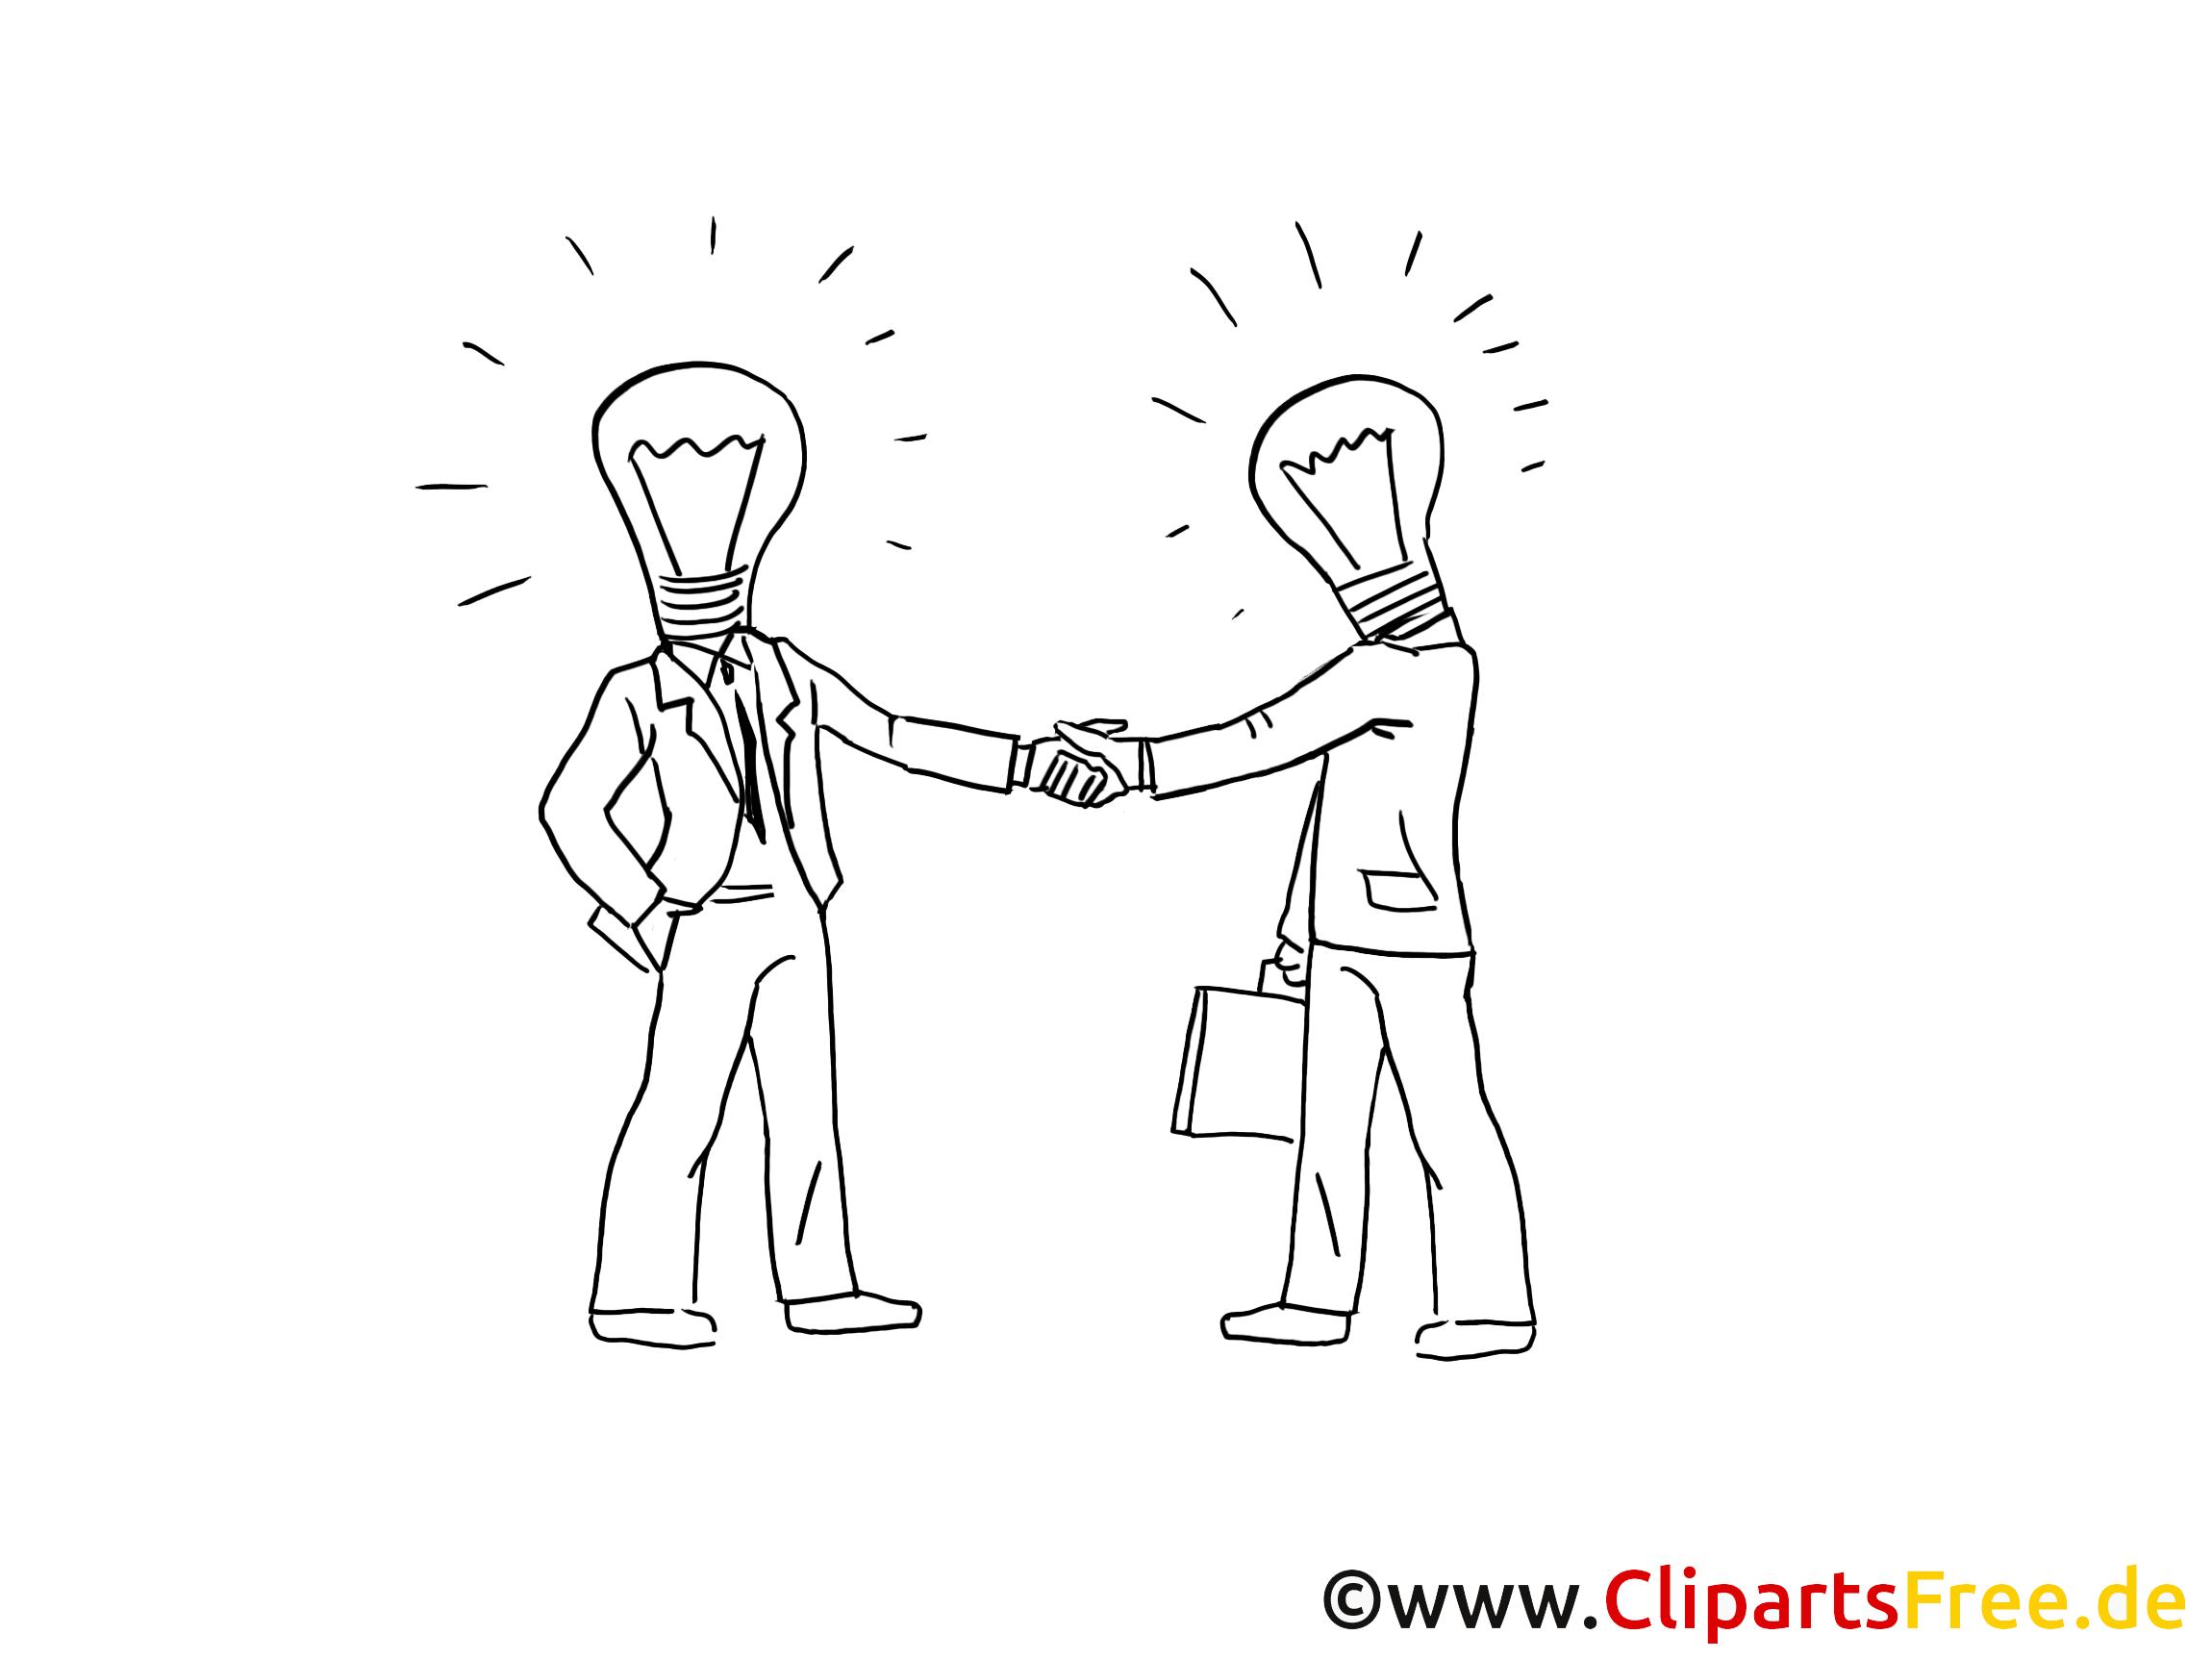 Ideenfindung Cliparts schwarz-weiss